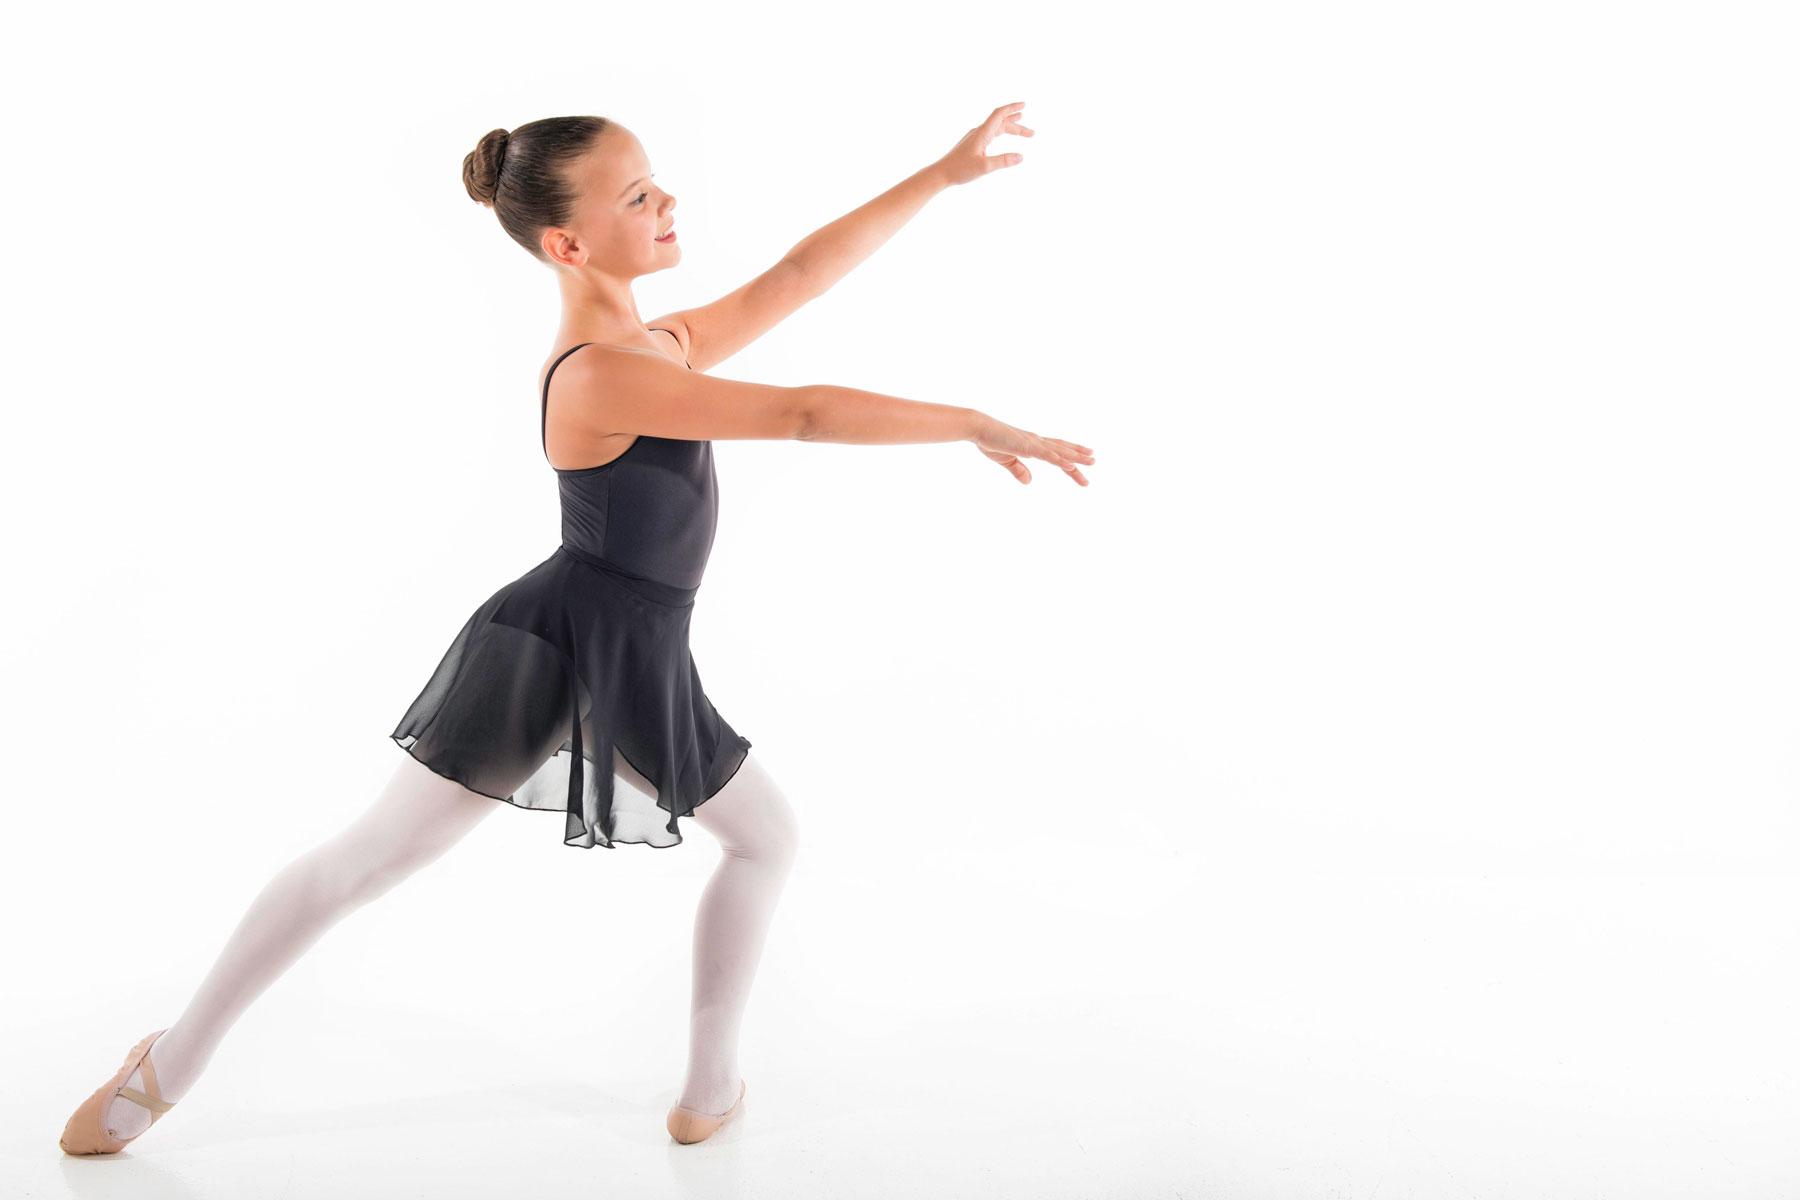 About the National Ballet Studio Dubai